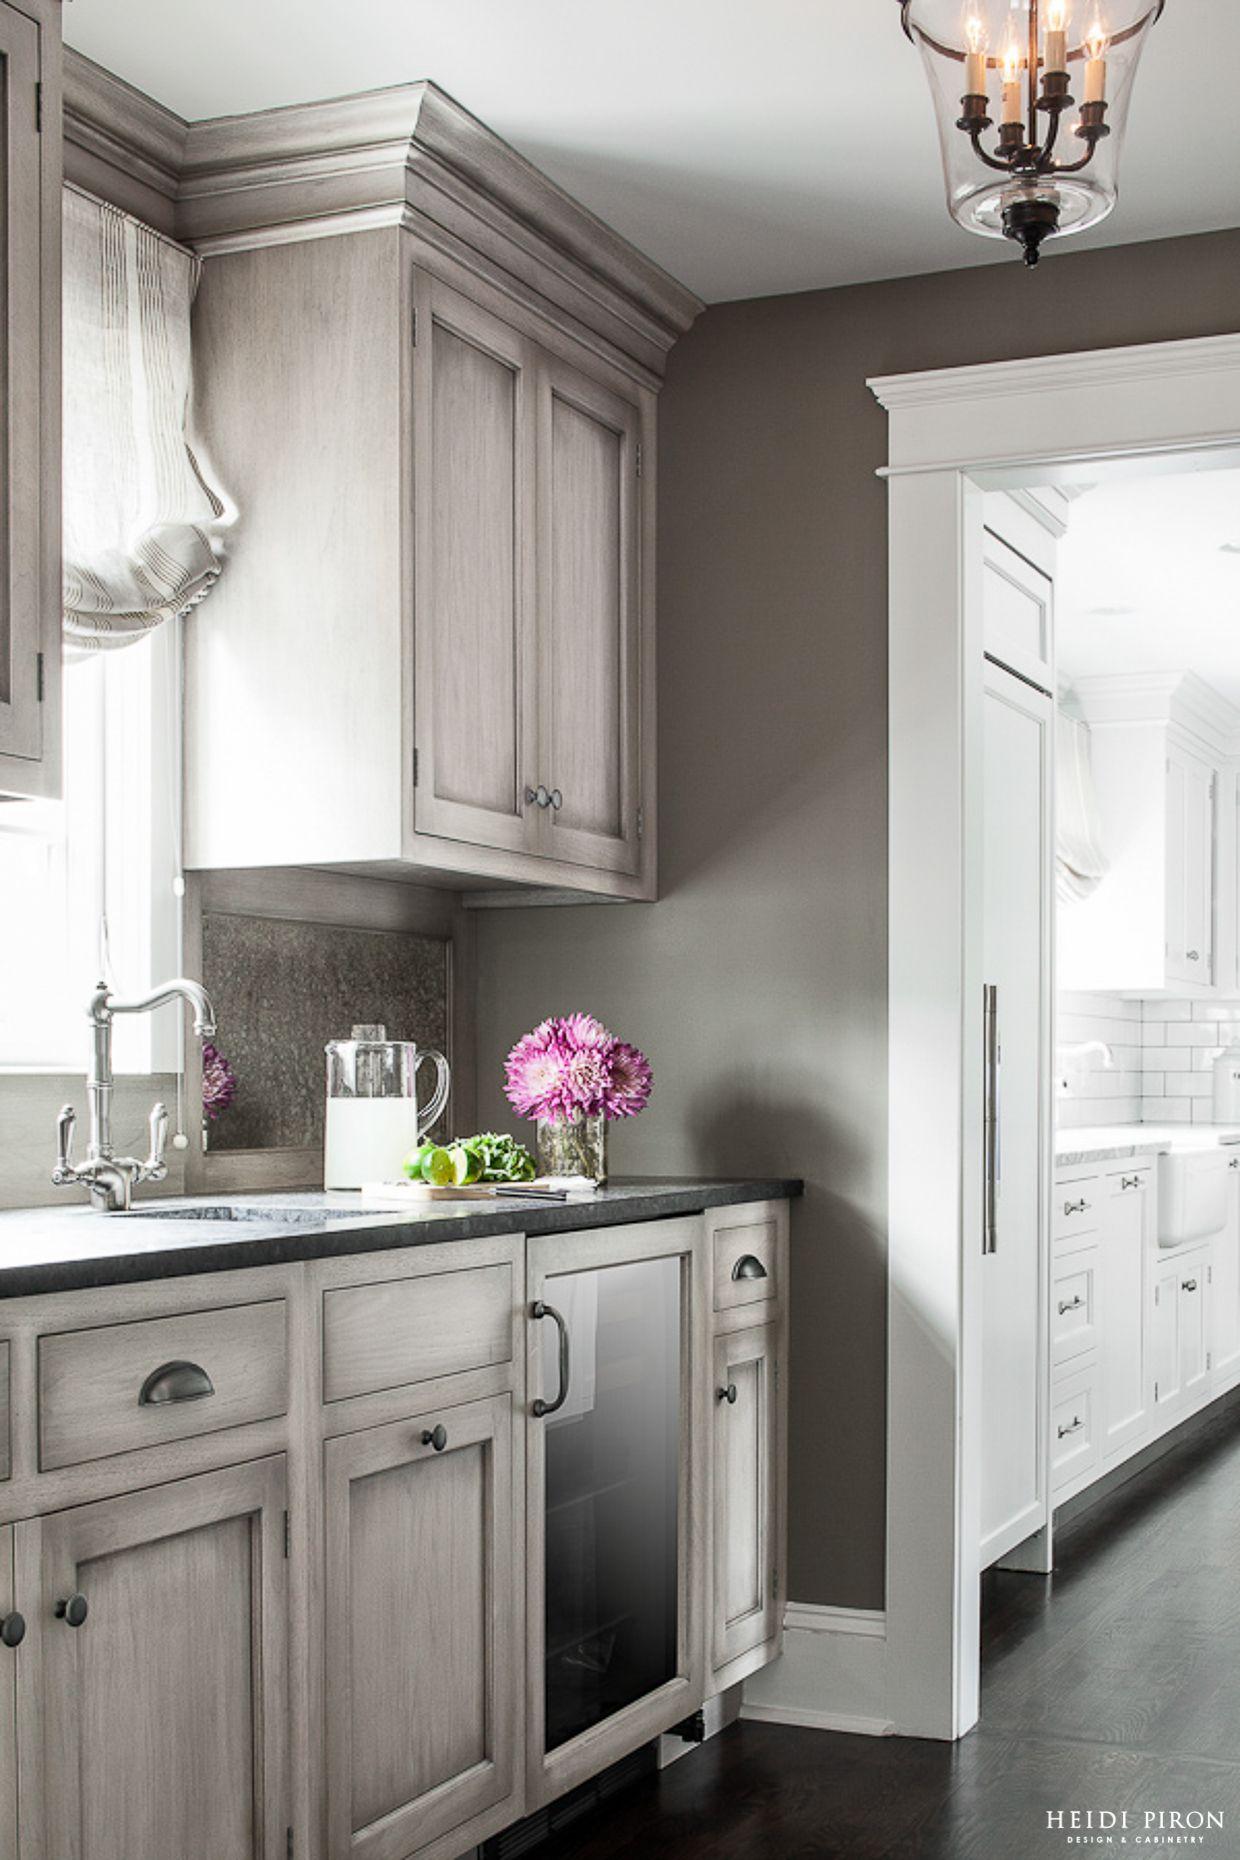 Award-winning kitchen designer, Heidi Piron, creates hand-crafted kitchens  and customized